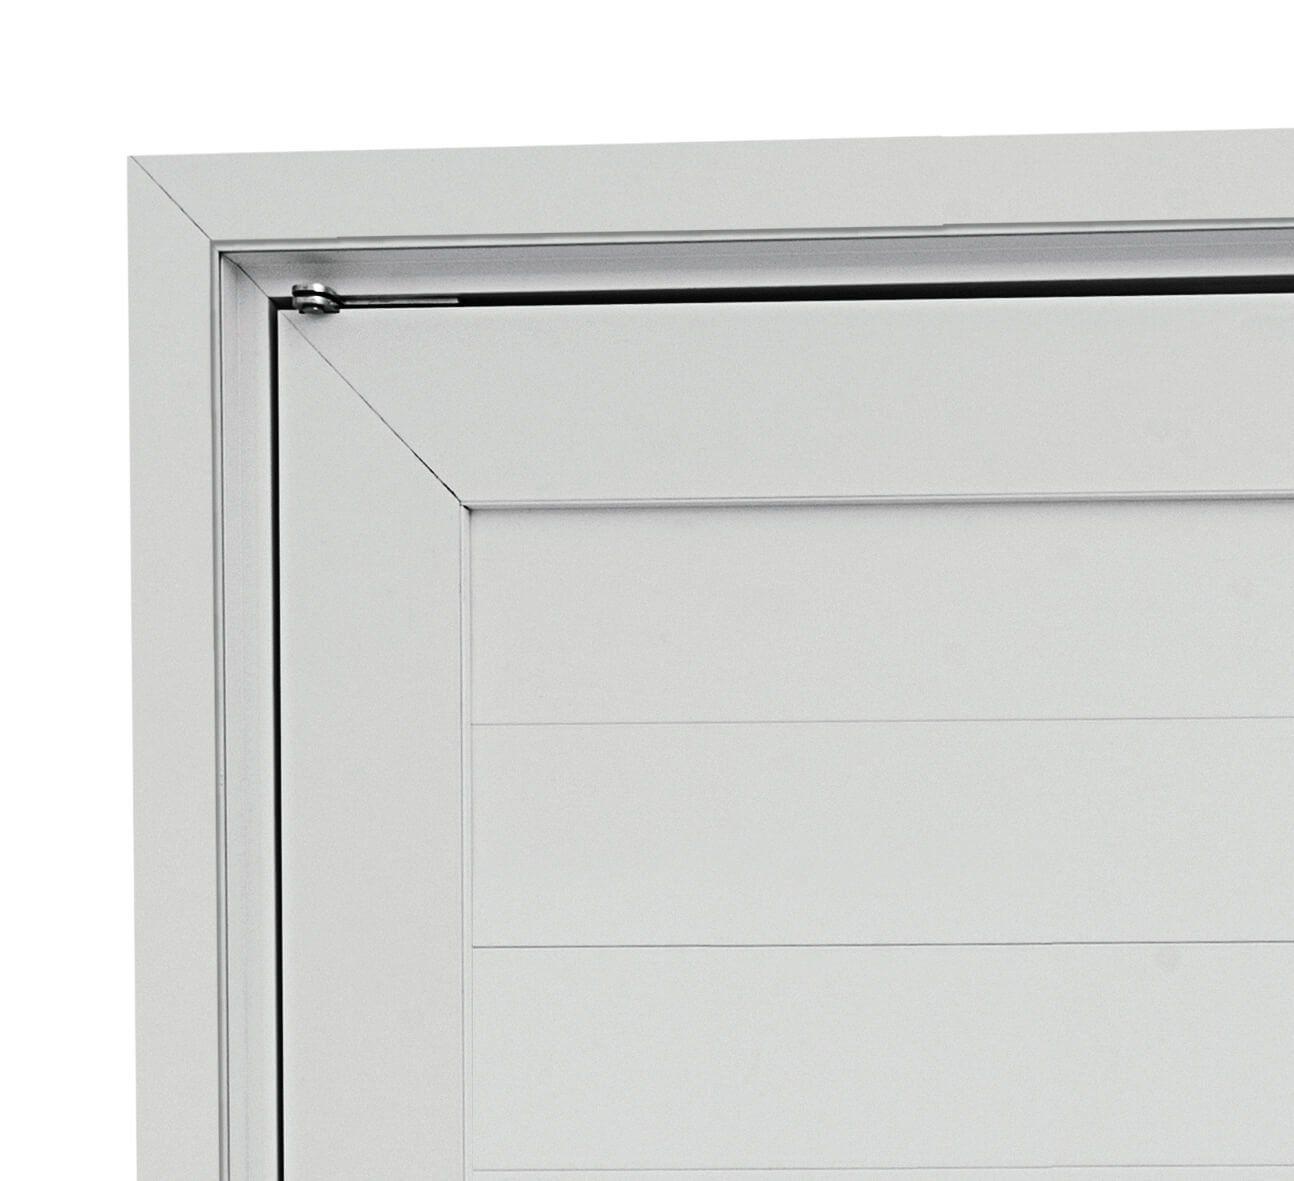 Aluminium Guarnição - 223.5x126.2x12.0 Ref. 72.92.821-0 Sasazaki